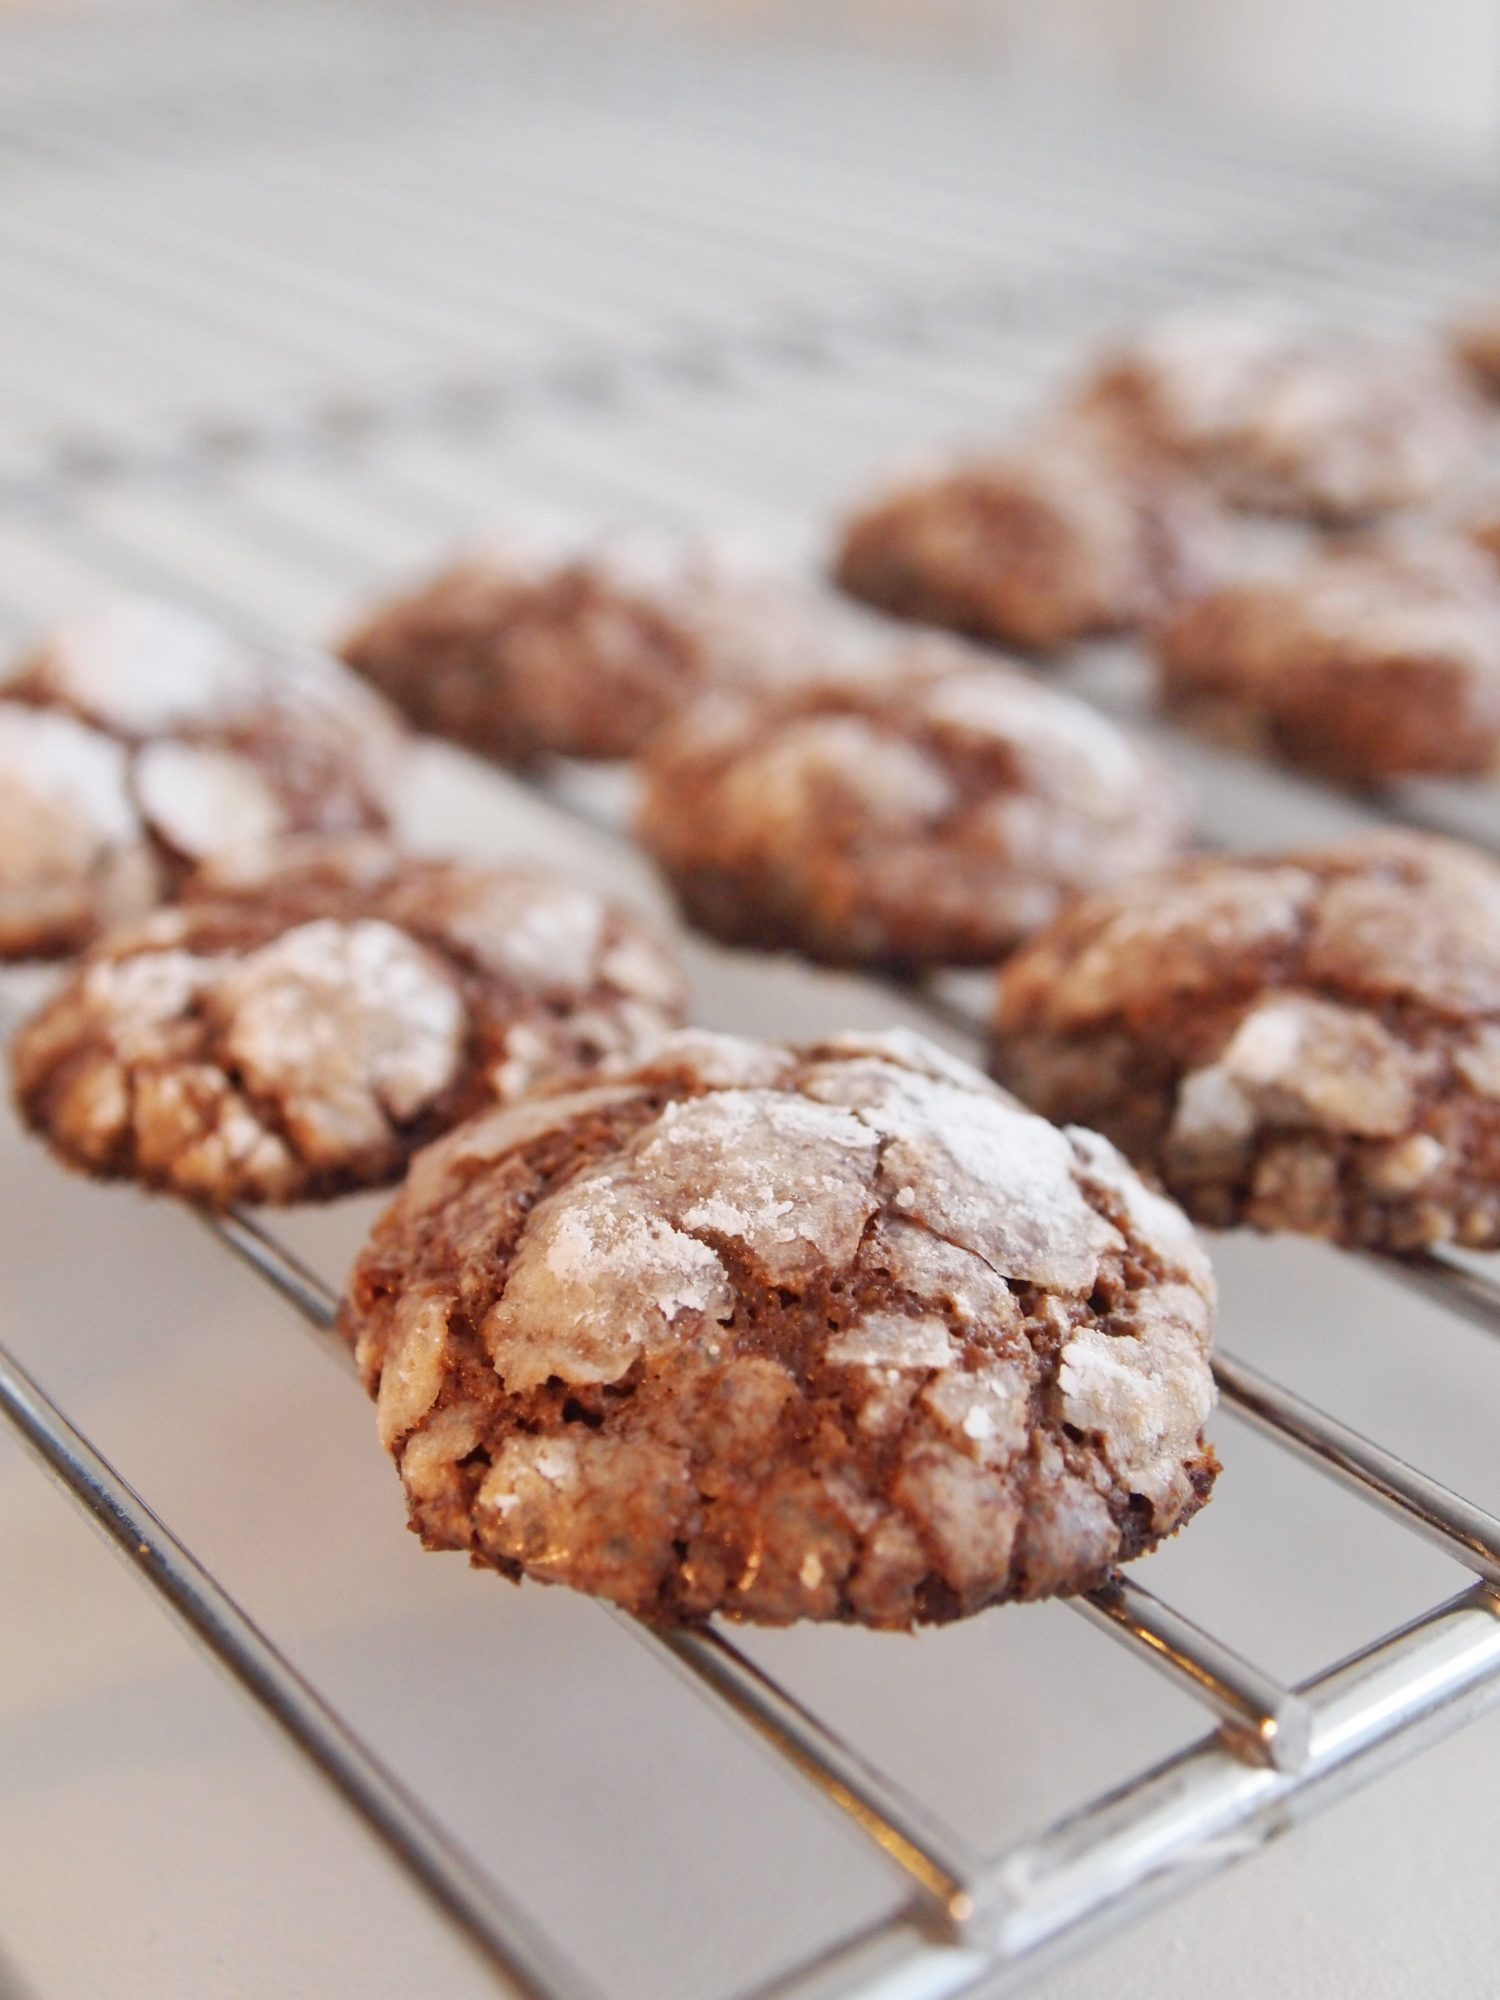 Cheerios™ - Dairy Free Chocolate Truffle Cookies